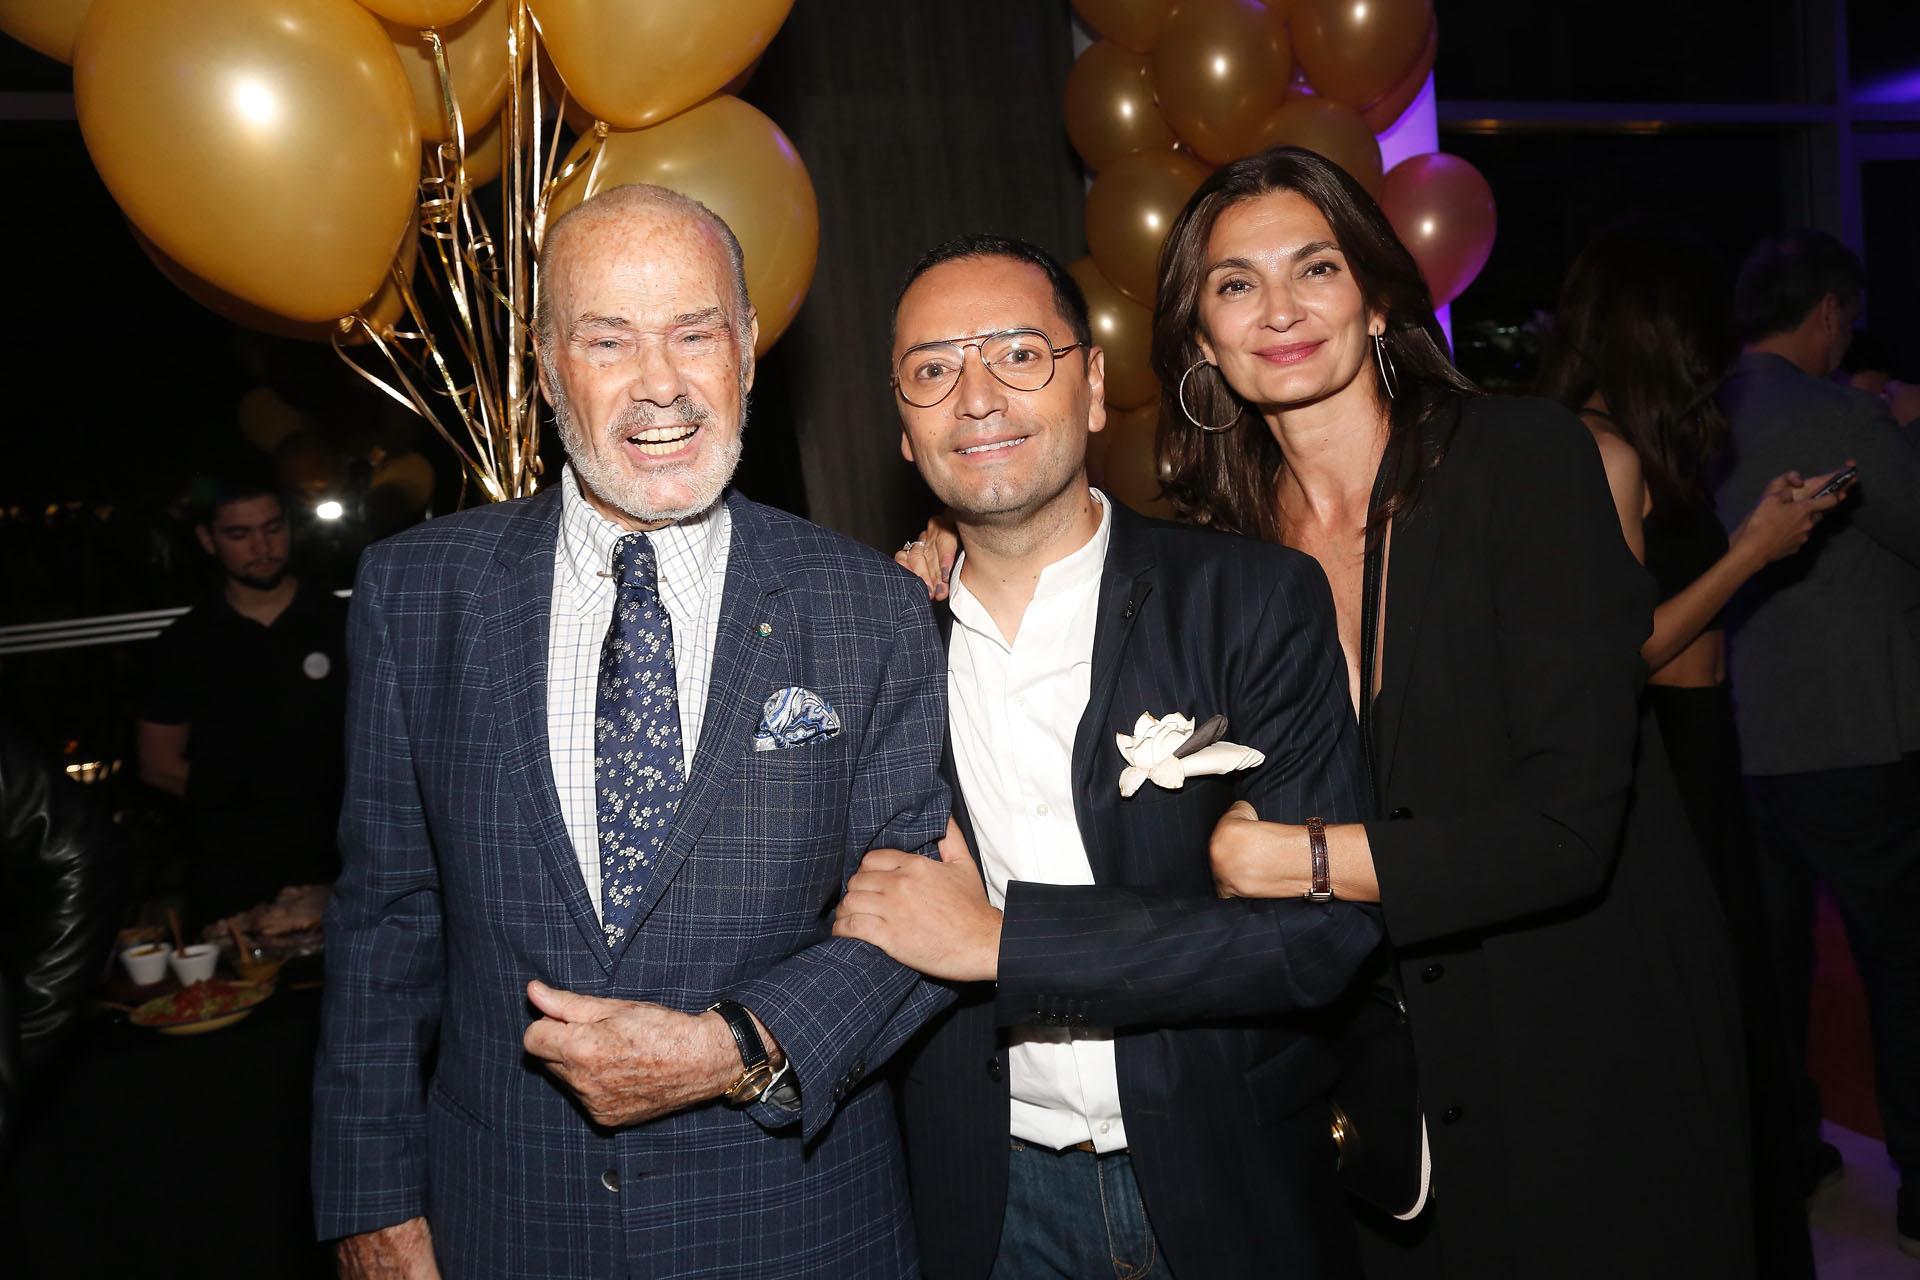 Gino Bogani, Fabián Medina Flores y Mariana Arias